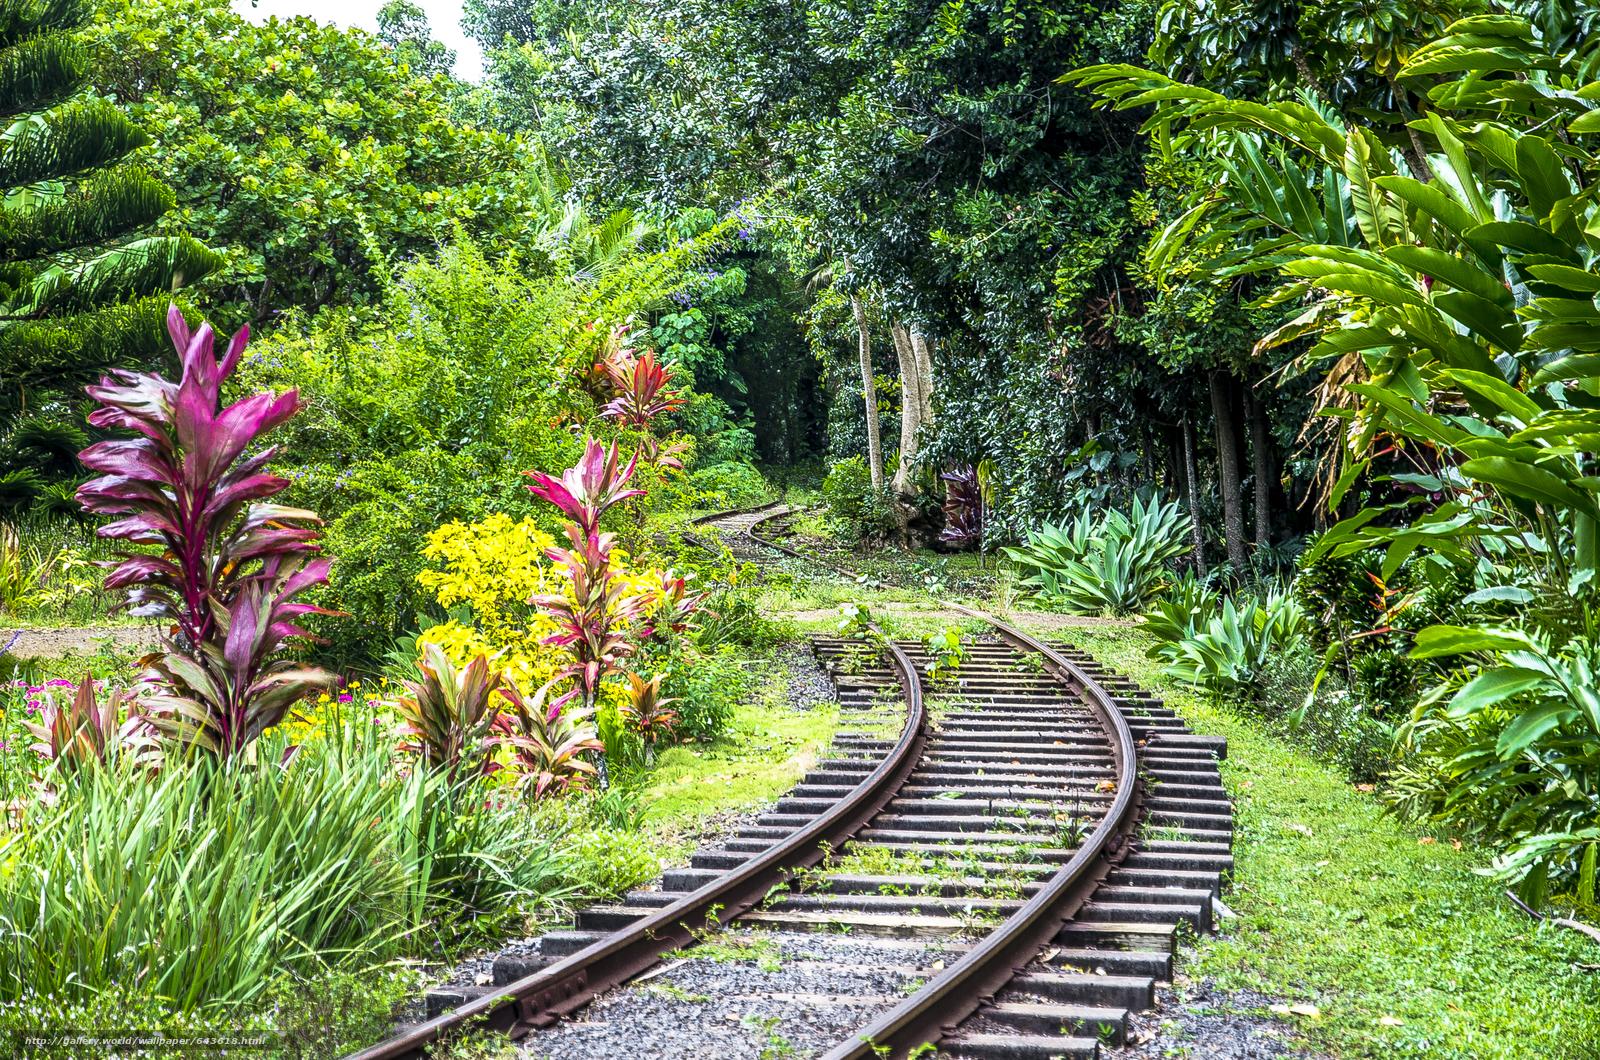 Download wallpaper Kauai Island,  Hawaiian Islands,  railroad,  forest free desktop wallpaper in the resolution 4928x3264 — picture №643618